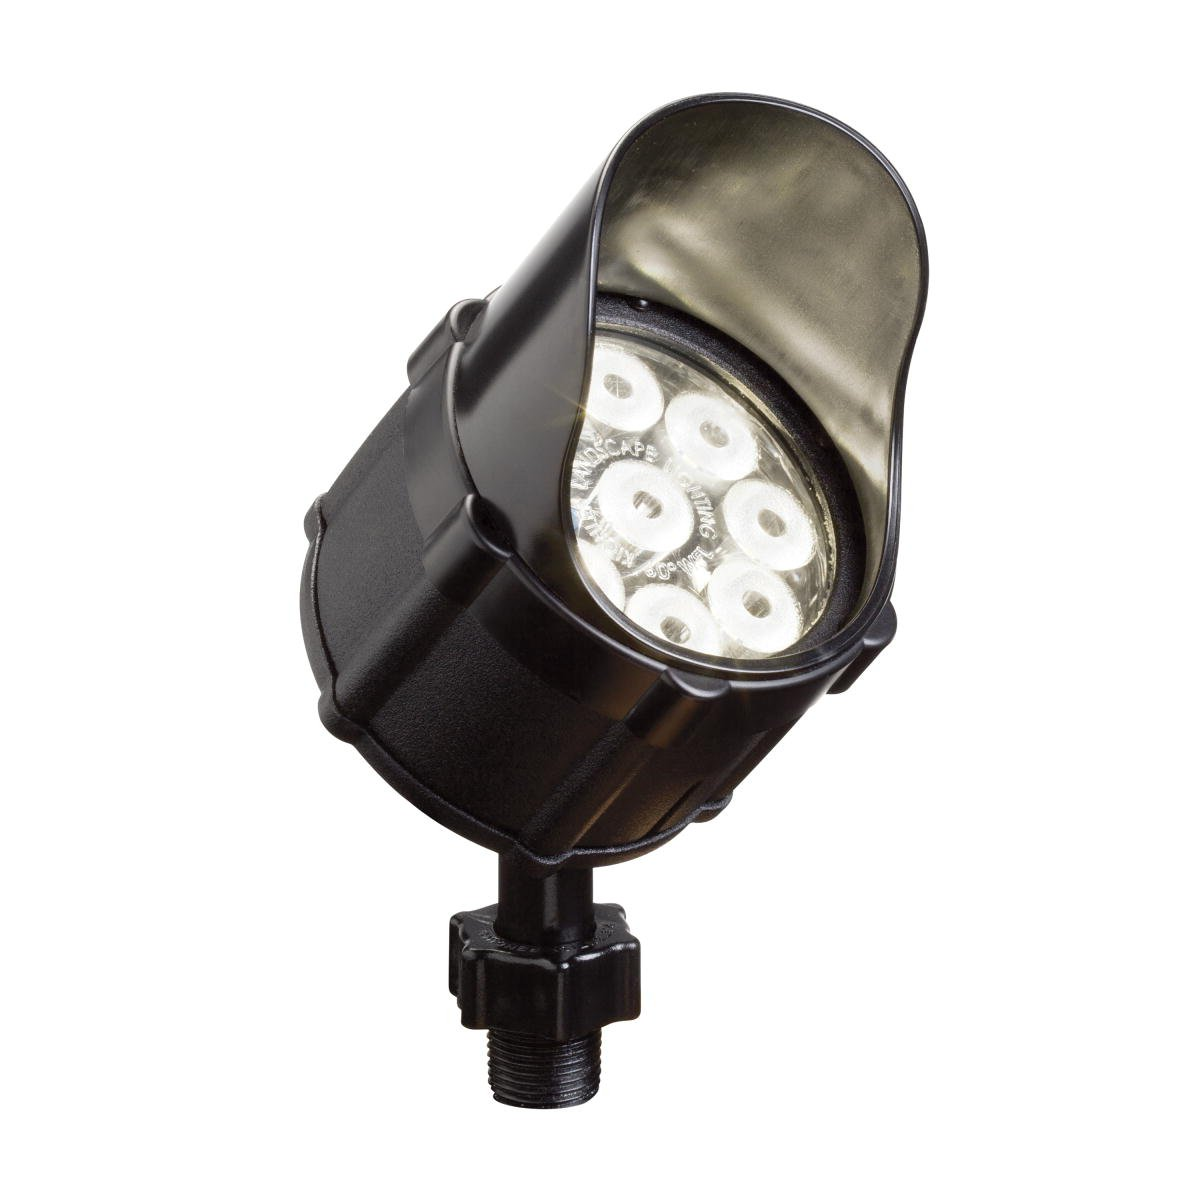 Kichler Lighting 15752BKT LED Accent Light 9-Light Low Voltage 35 Degree Flood Light, Textured Black with Clear Tempered Glass Lens by Kichler Lighting